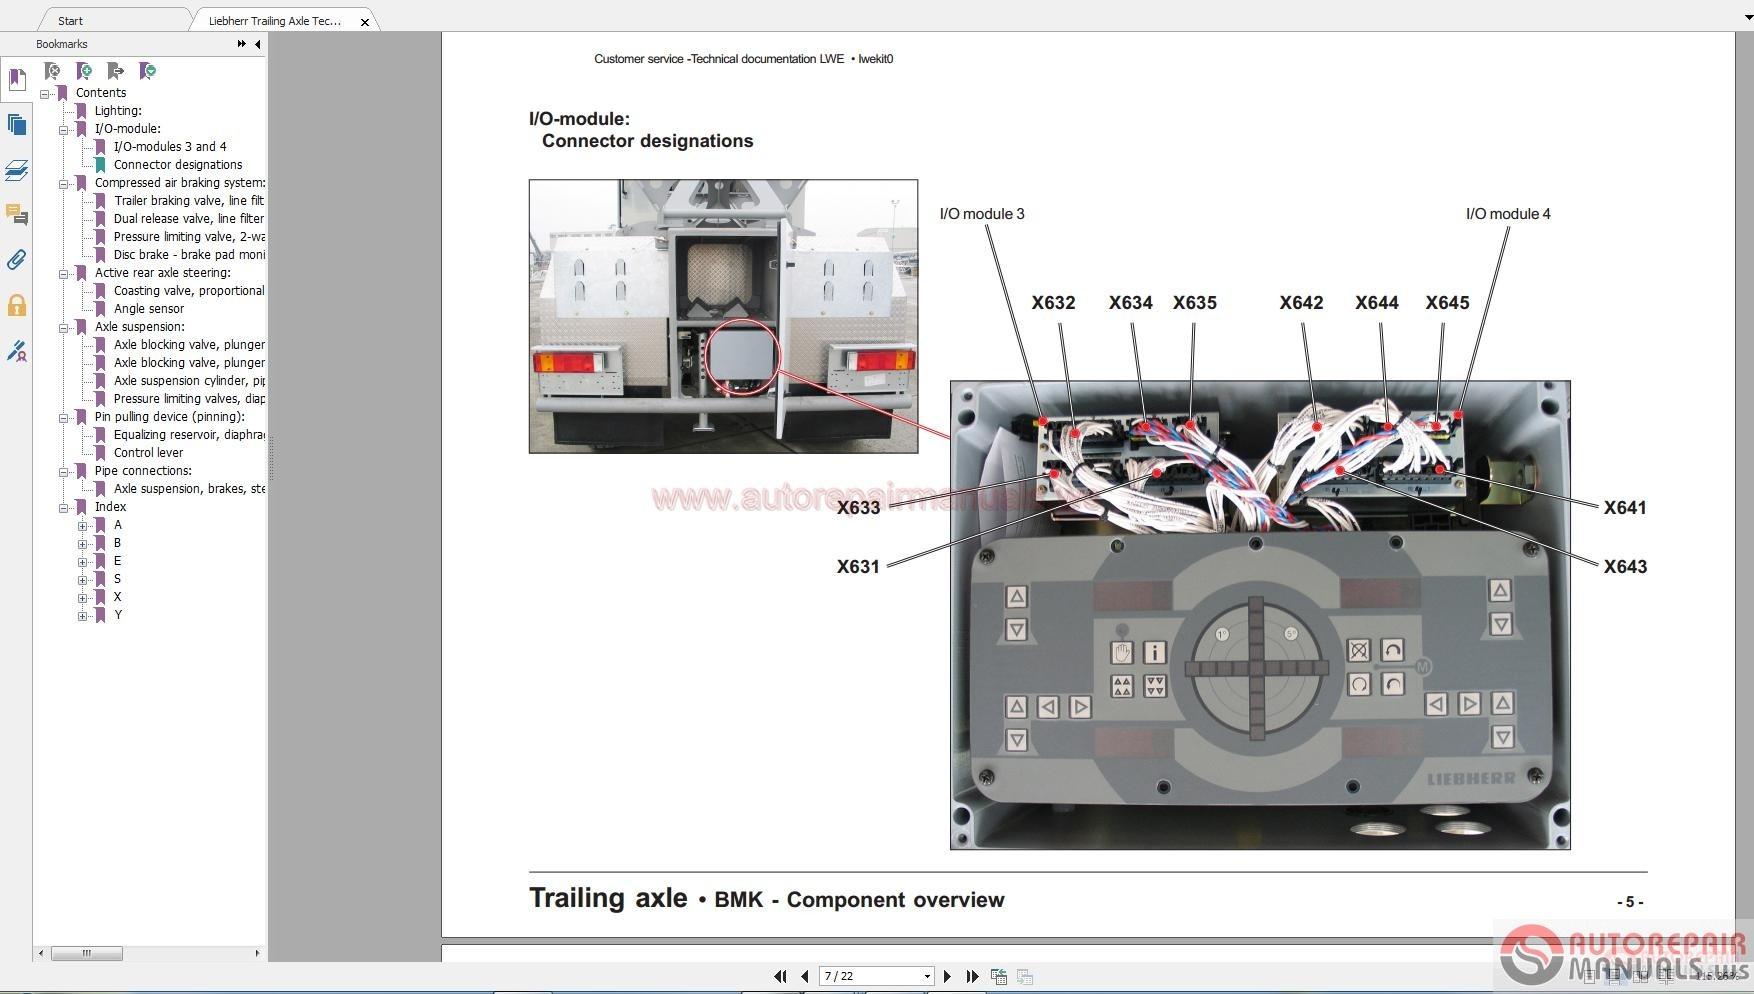 liebherr trailing axle technical information